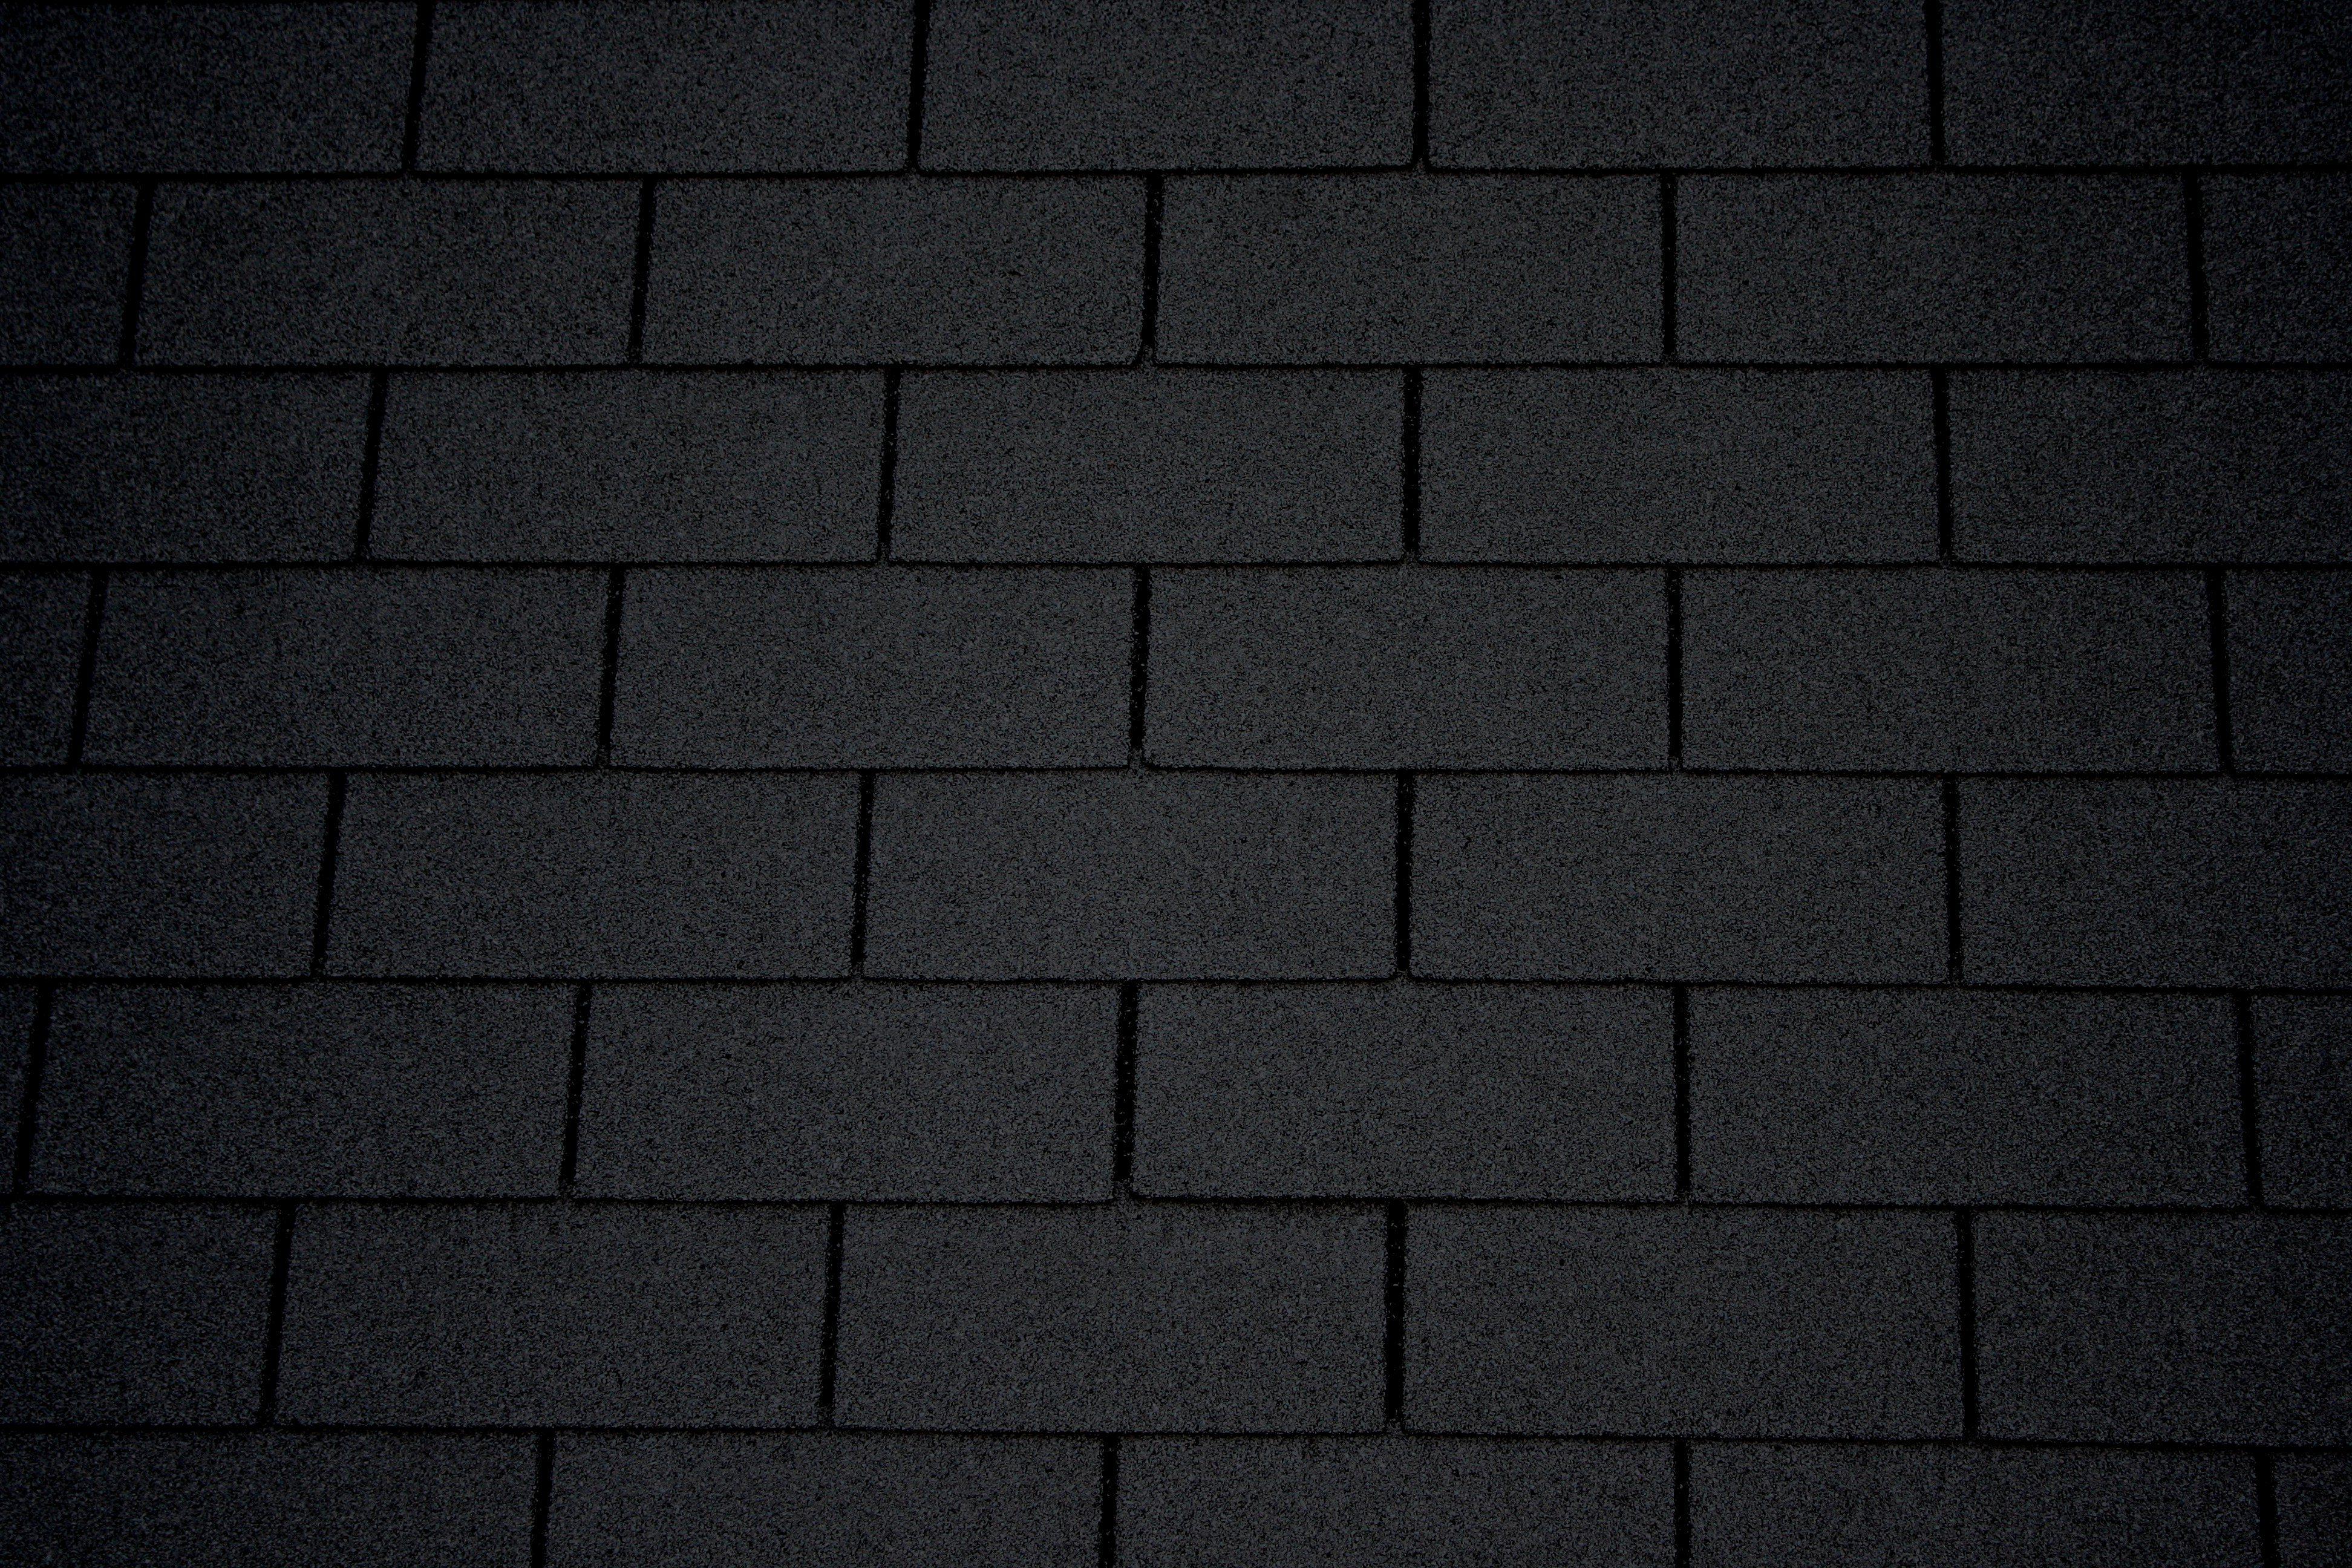 Best Black Roof Shingles Texture Gray Asphalt Roof Shingles 400 x 300